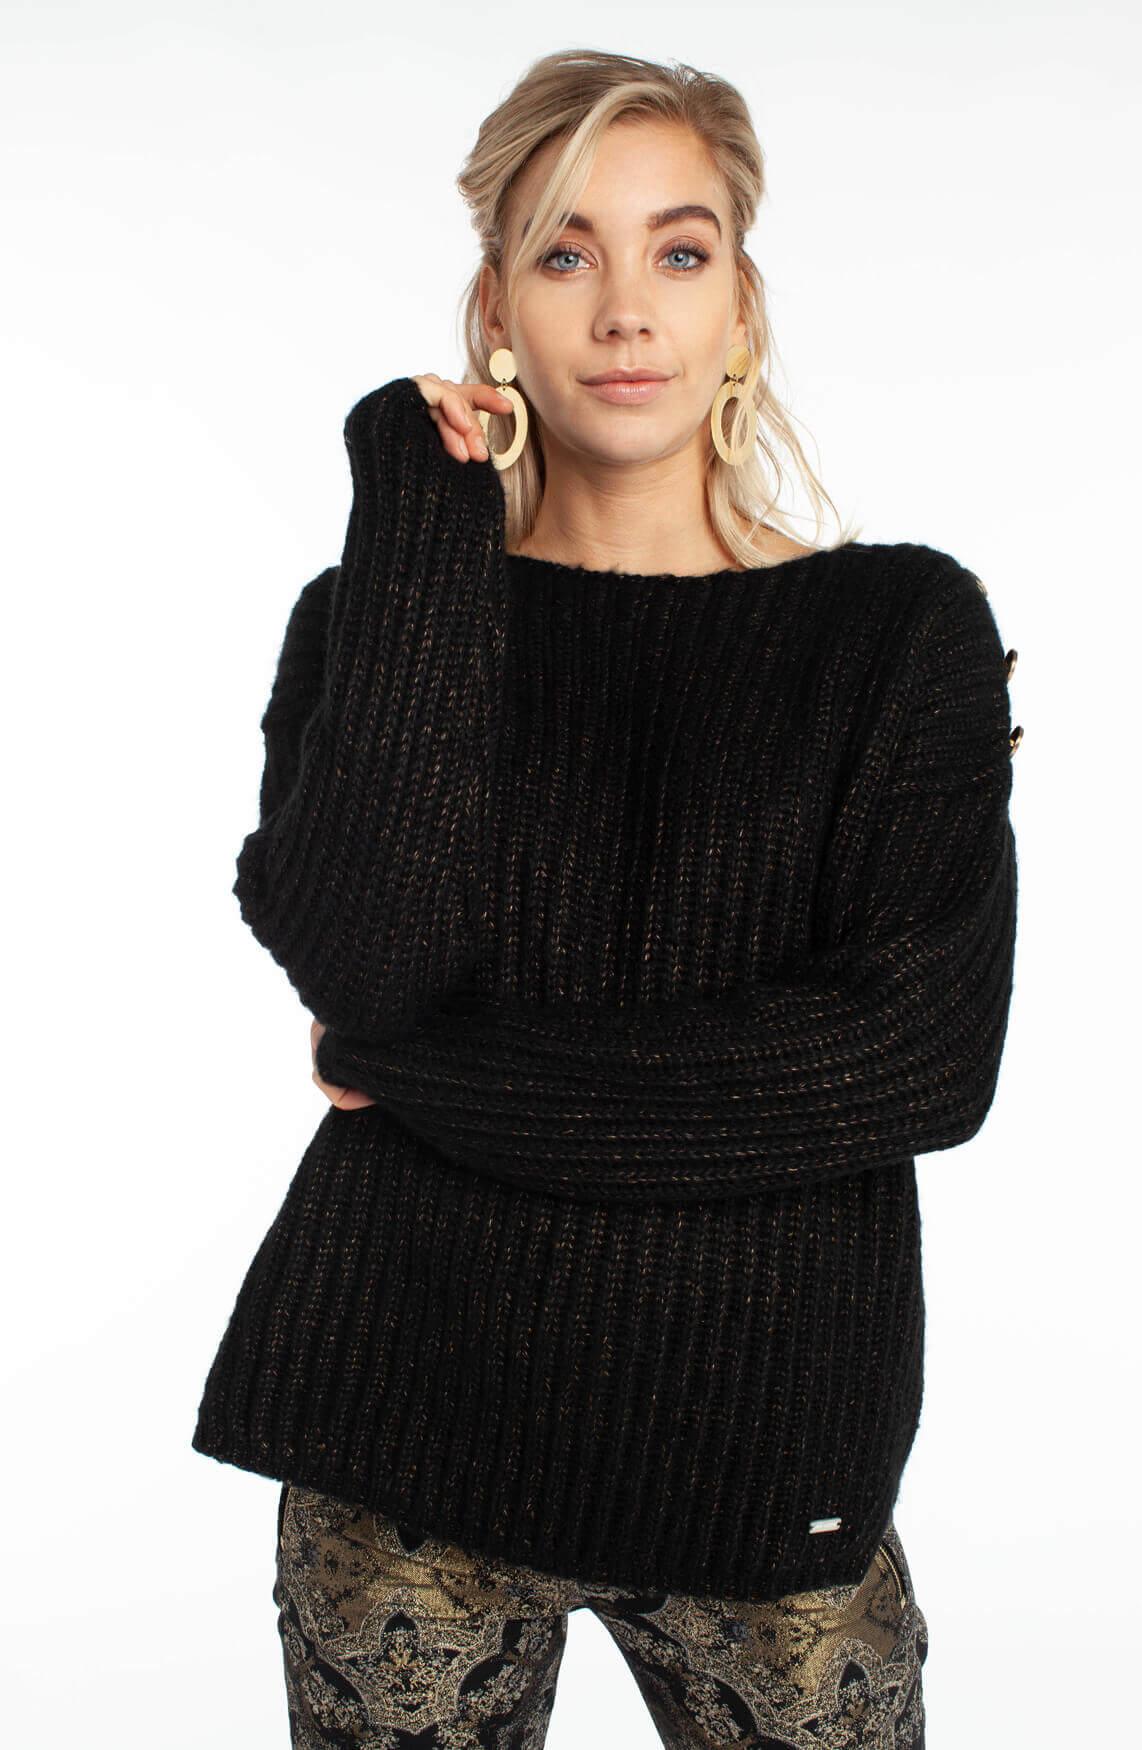 Jane Lushka Dames Grofgebreide trui met sierknopen zwart